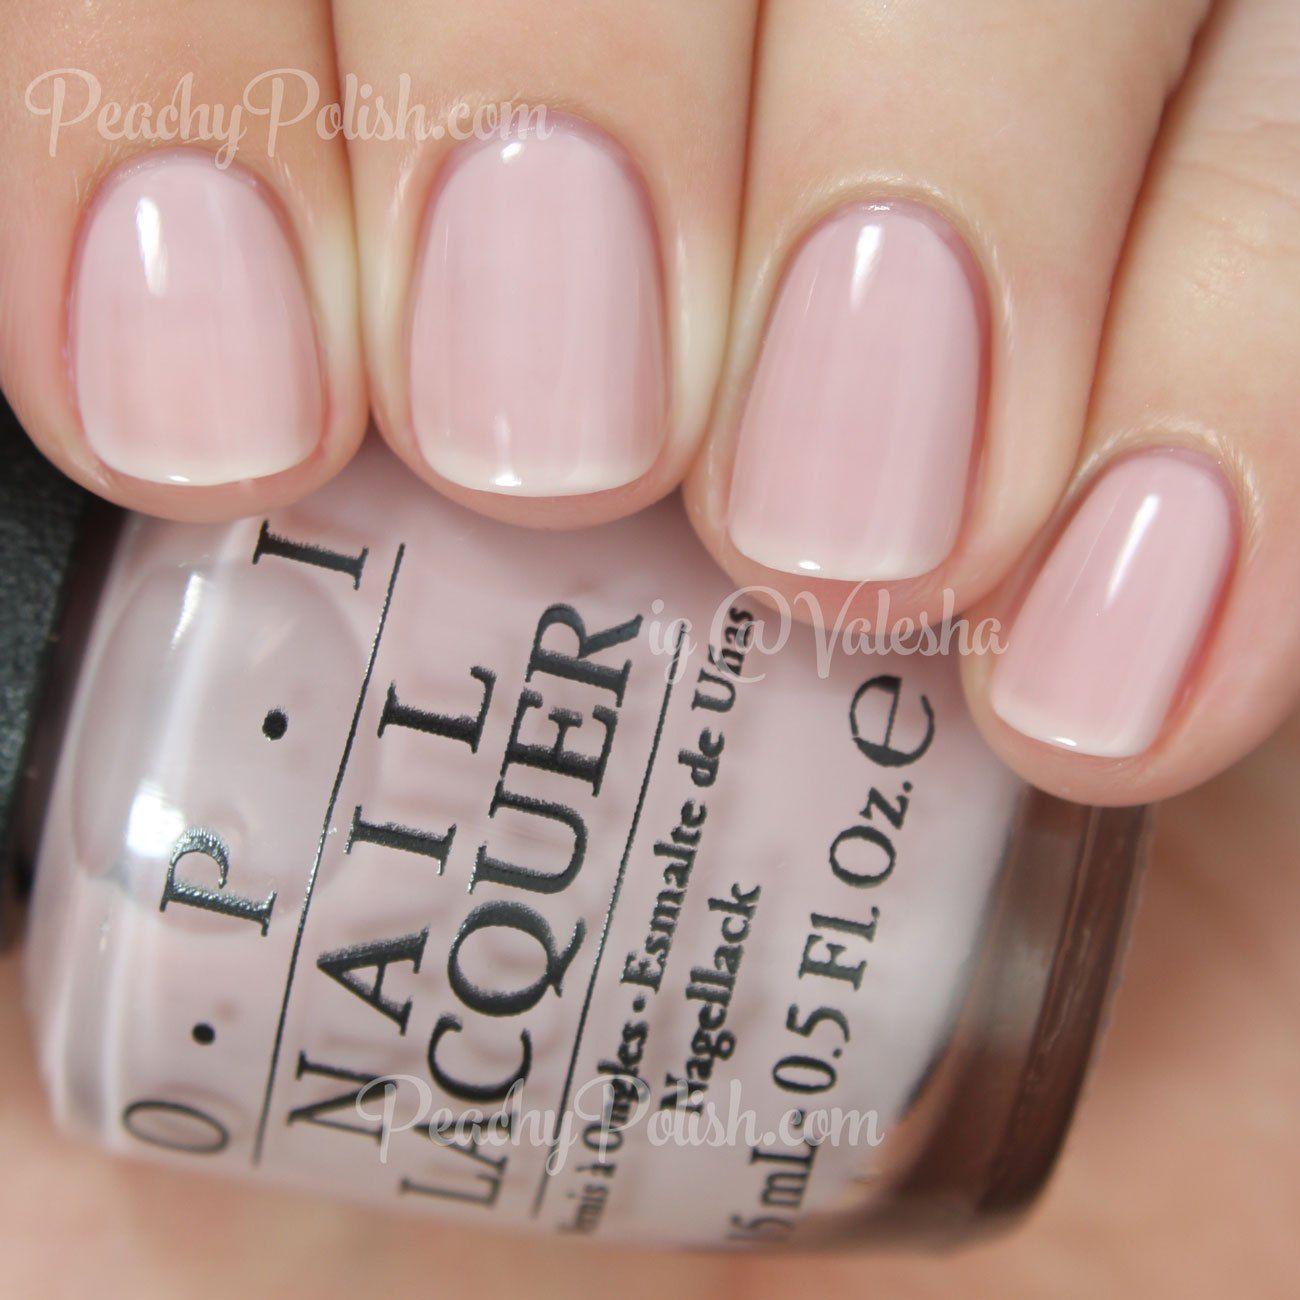 Opi Put It In Neutral Soft Shades 2015 Peachy Polish